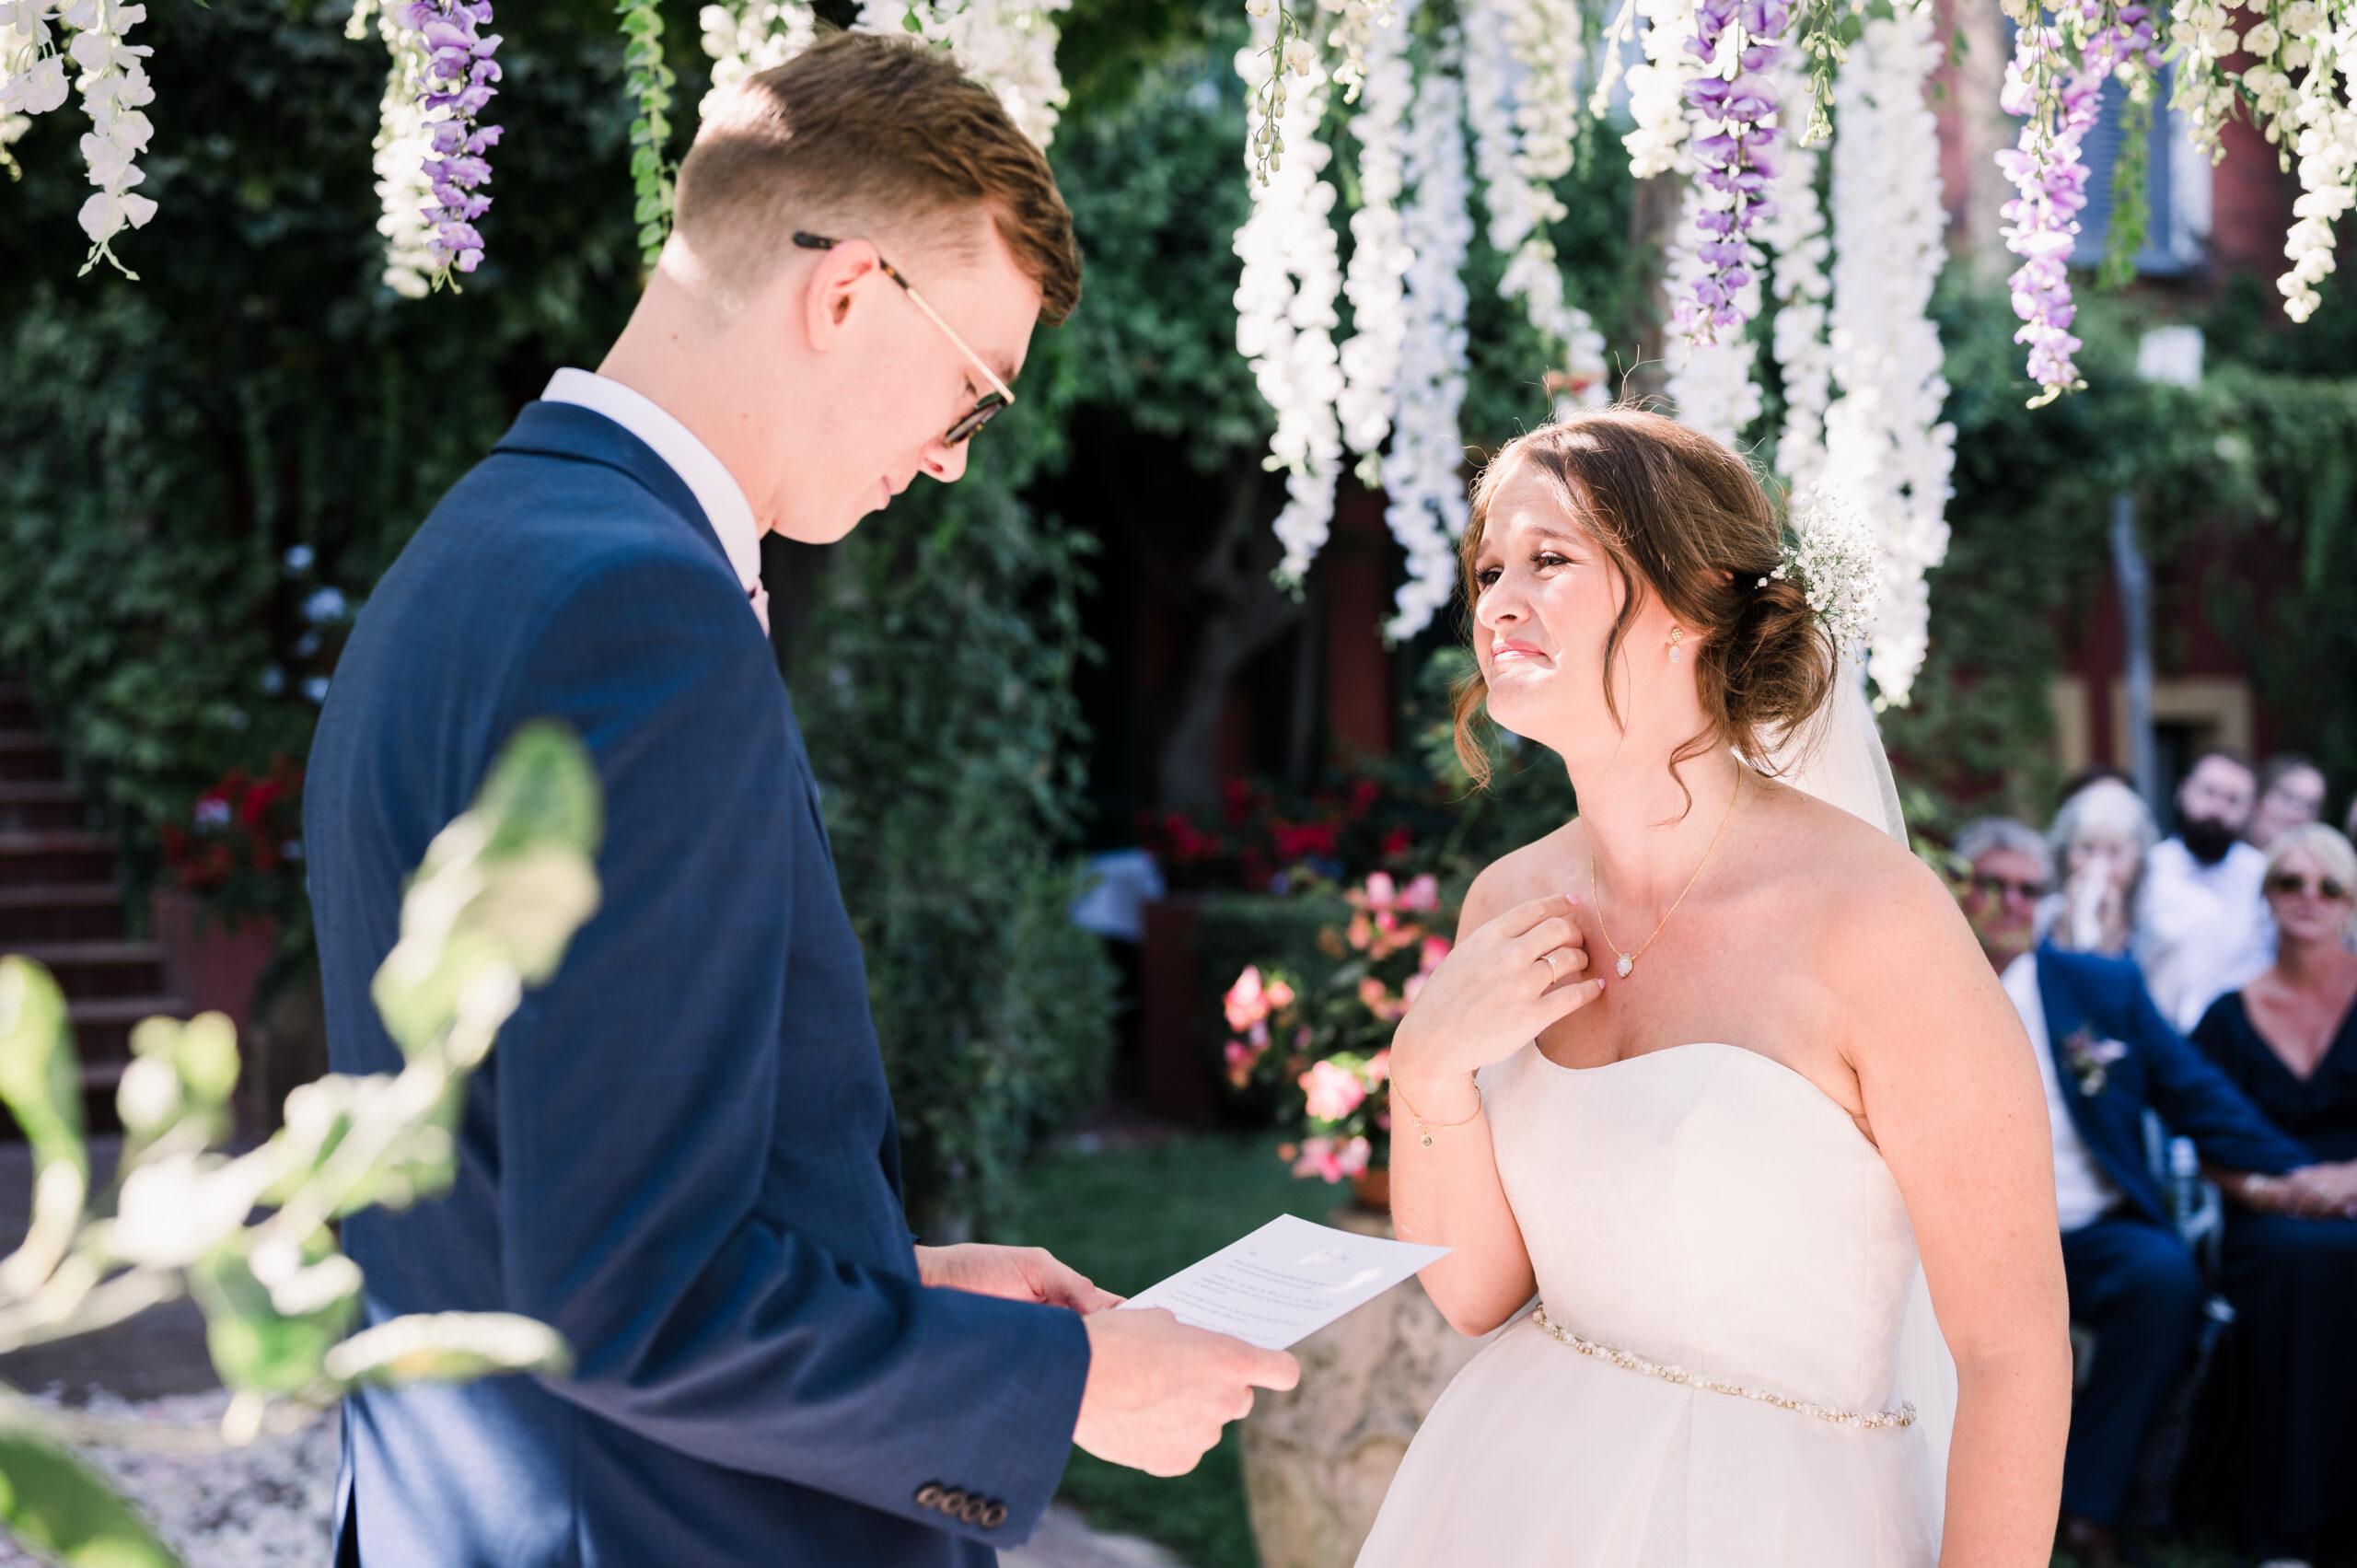 Ben and Holly wedding in Maiori, Amalfi Coast, Italy (7)